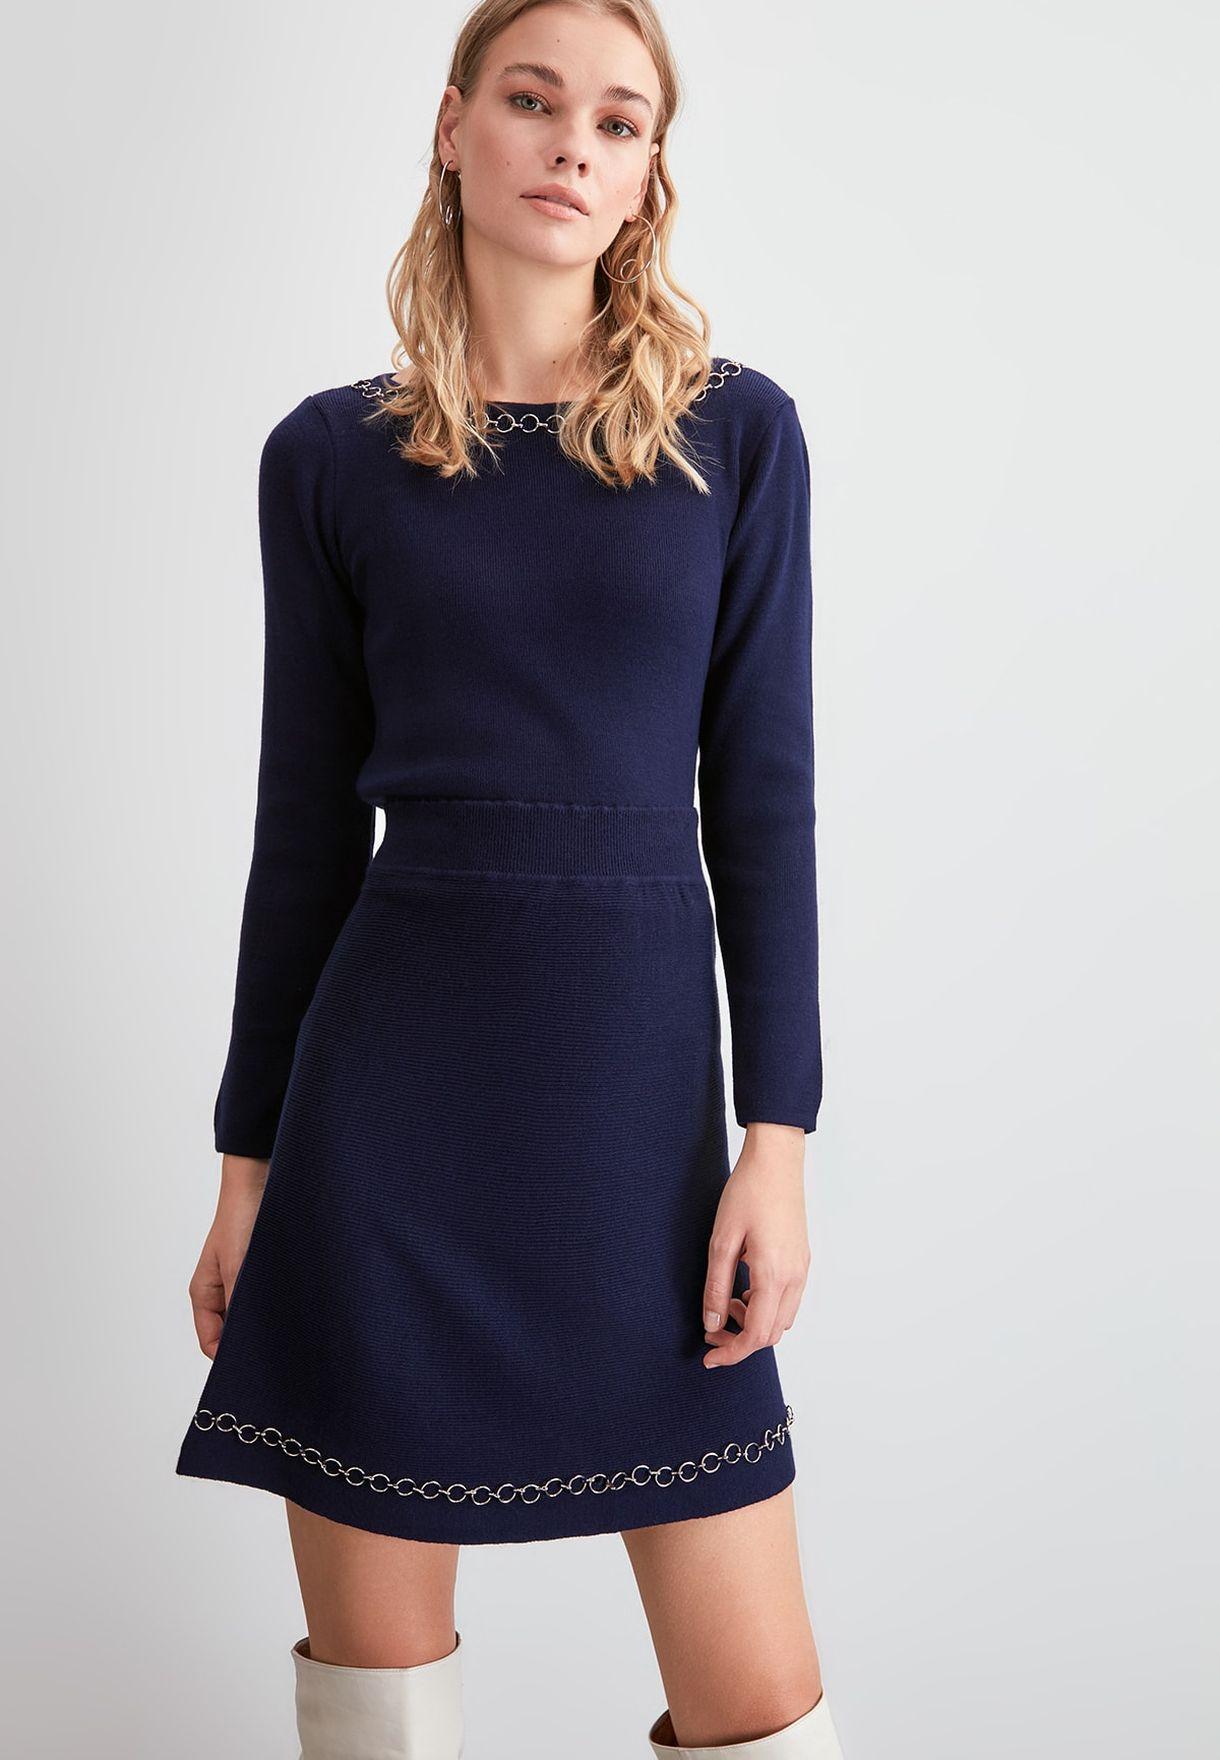 Trendyol Chain Detail Ribbed Skirt - Fashion